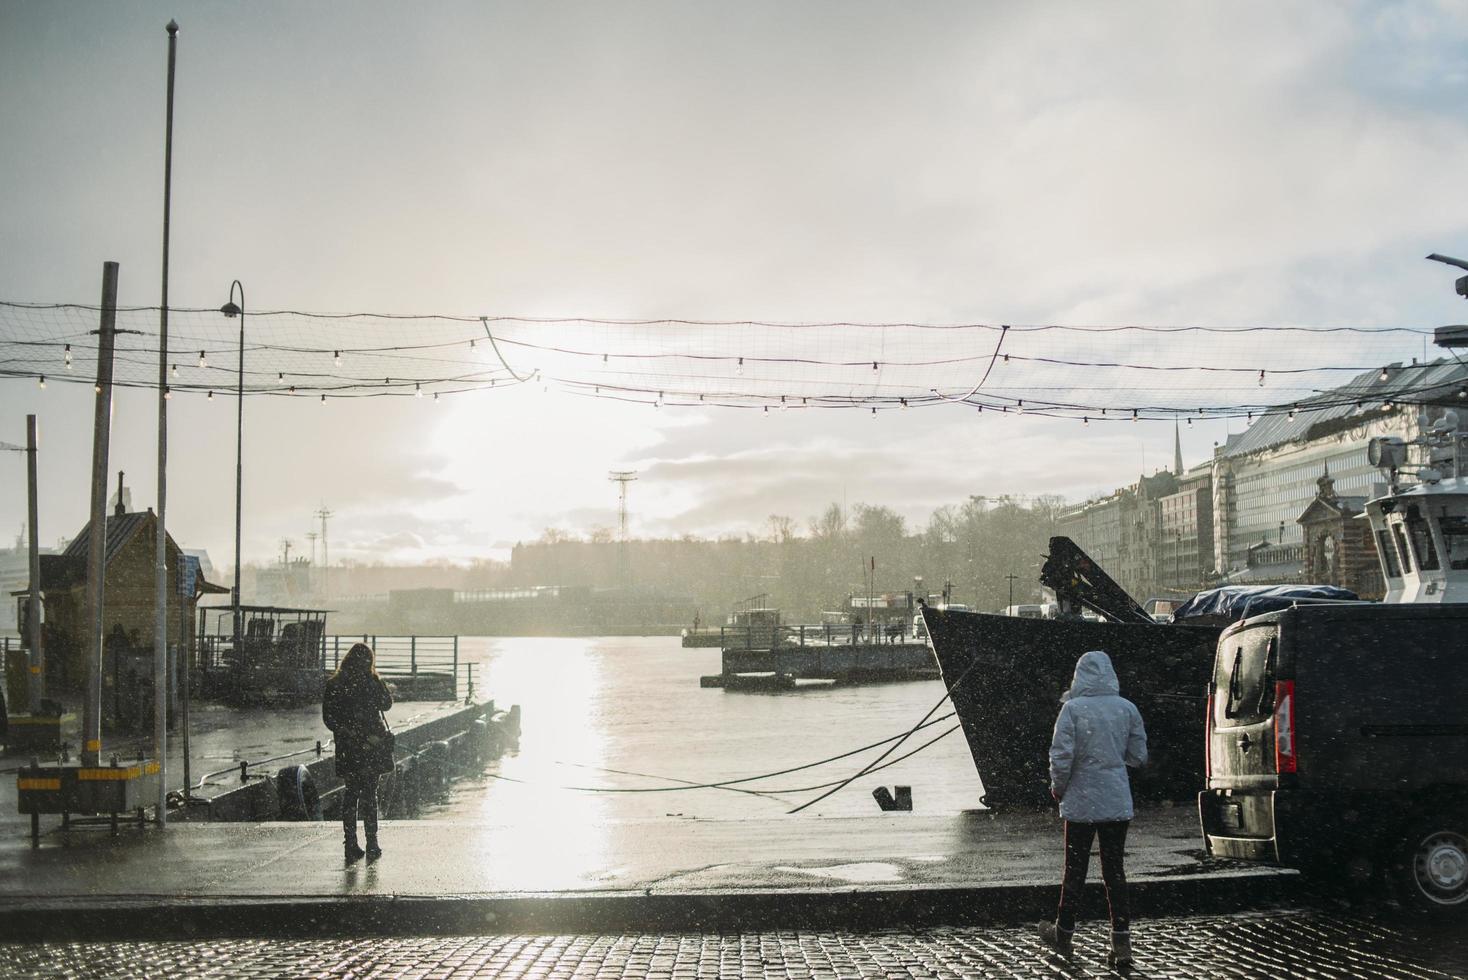 Helsingfors, Finland, 2021 - regnig dag i stadens hamn foto